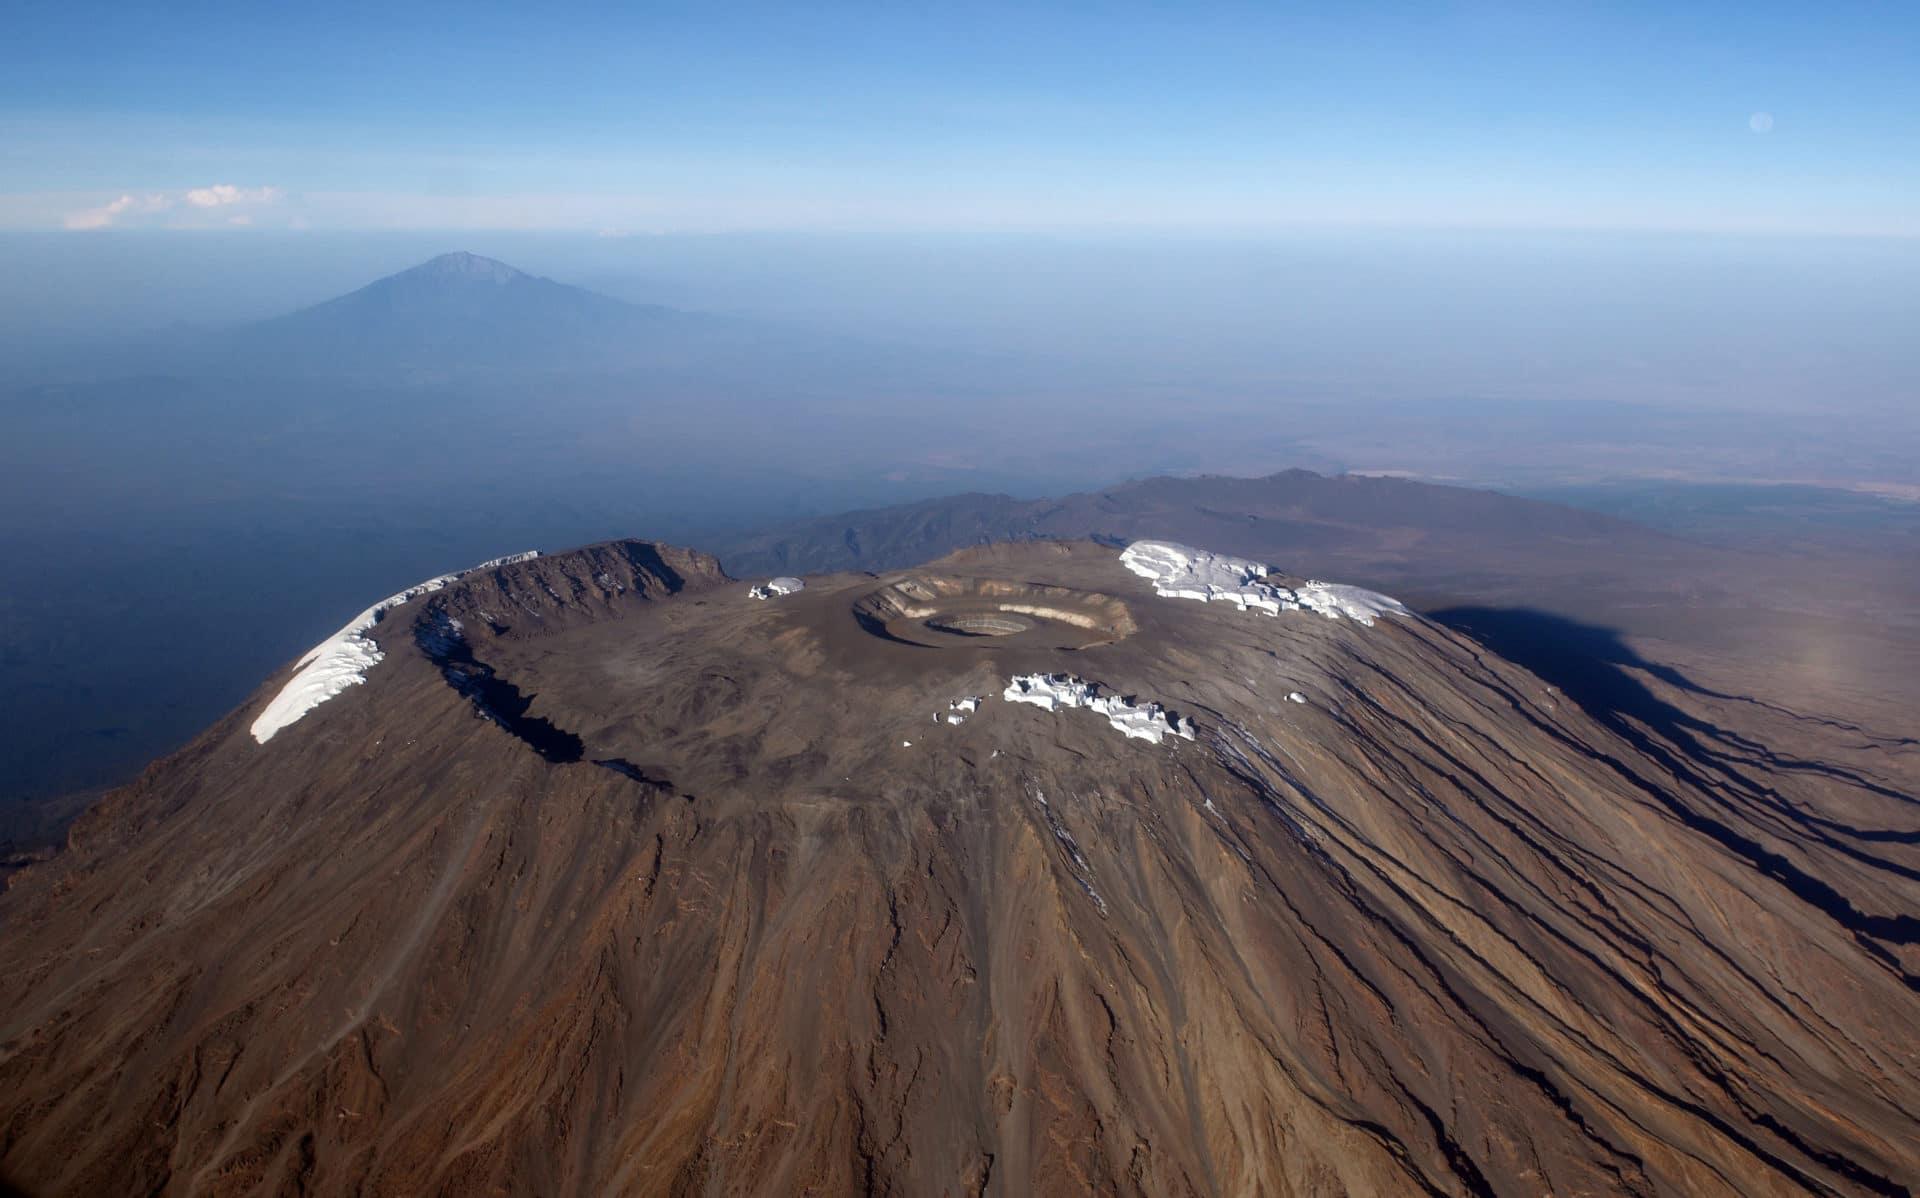 Kilimanjaro and Kibo from above